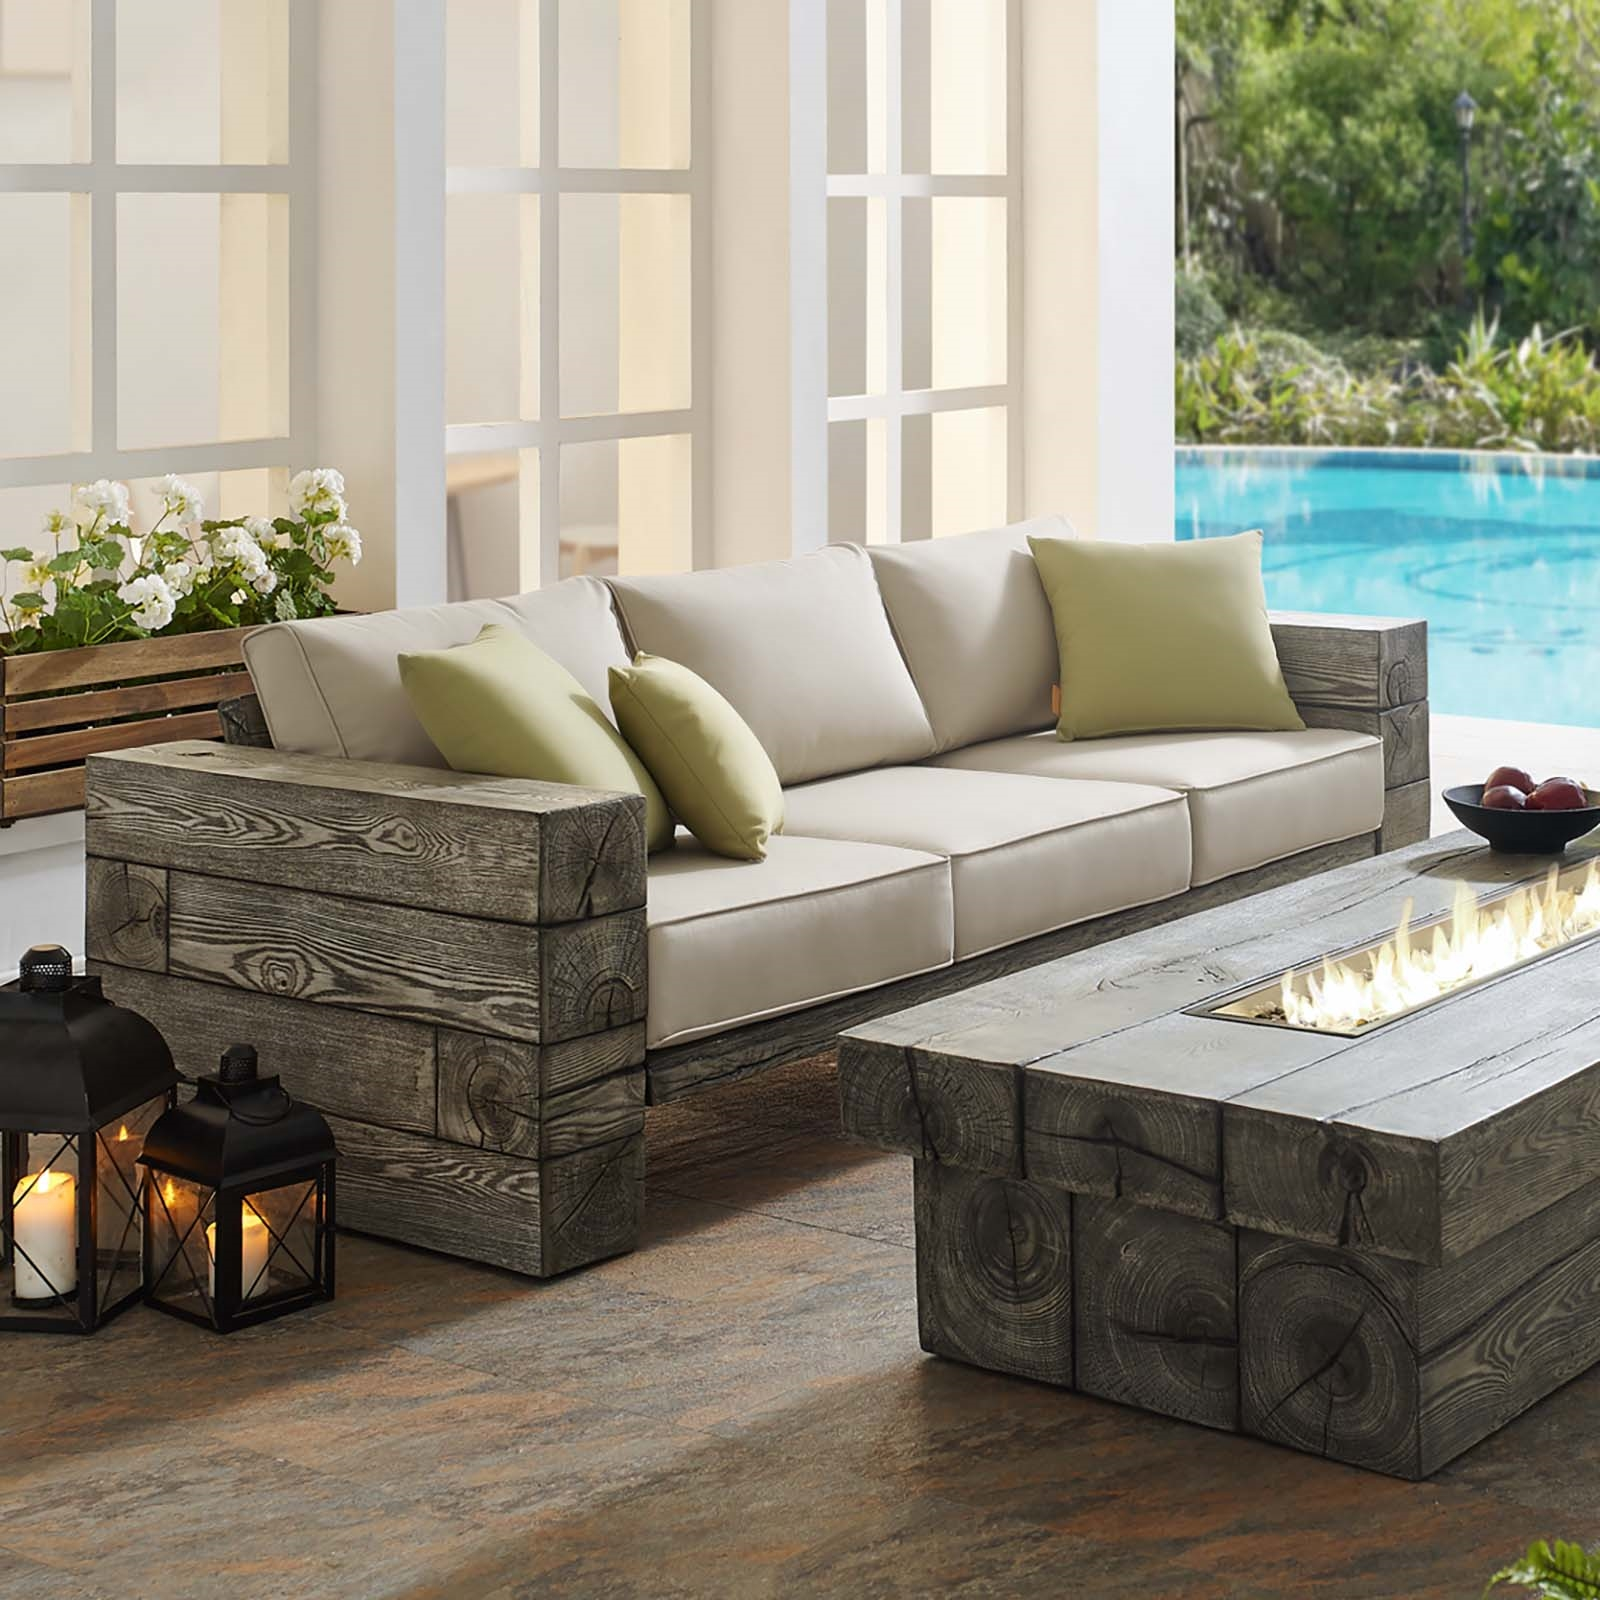 Manteo Rustic Coastal Outdoor Patio Sunbrella®  Sofa in Light Gray Beige